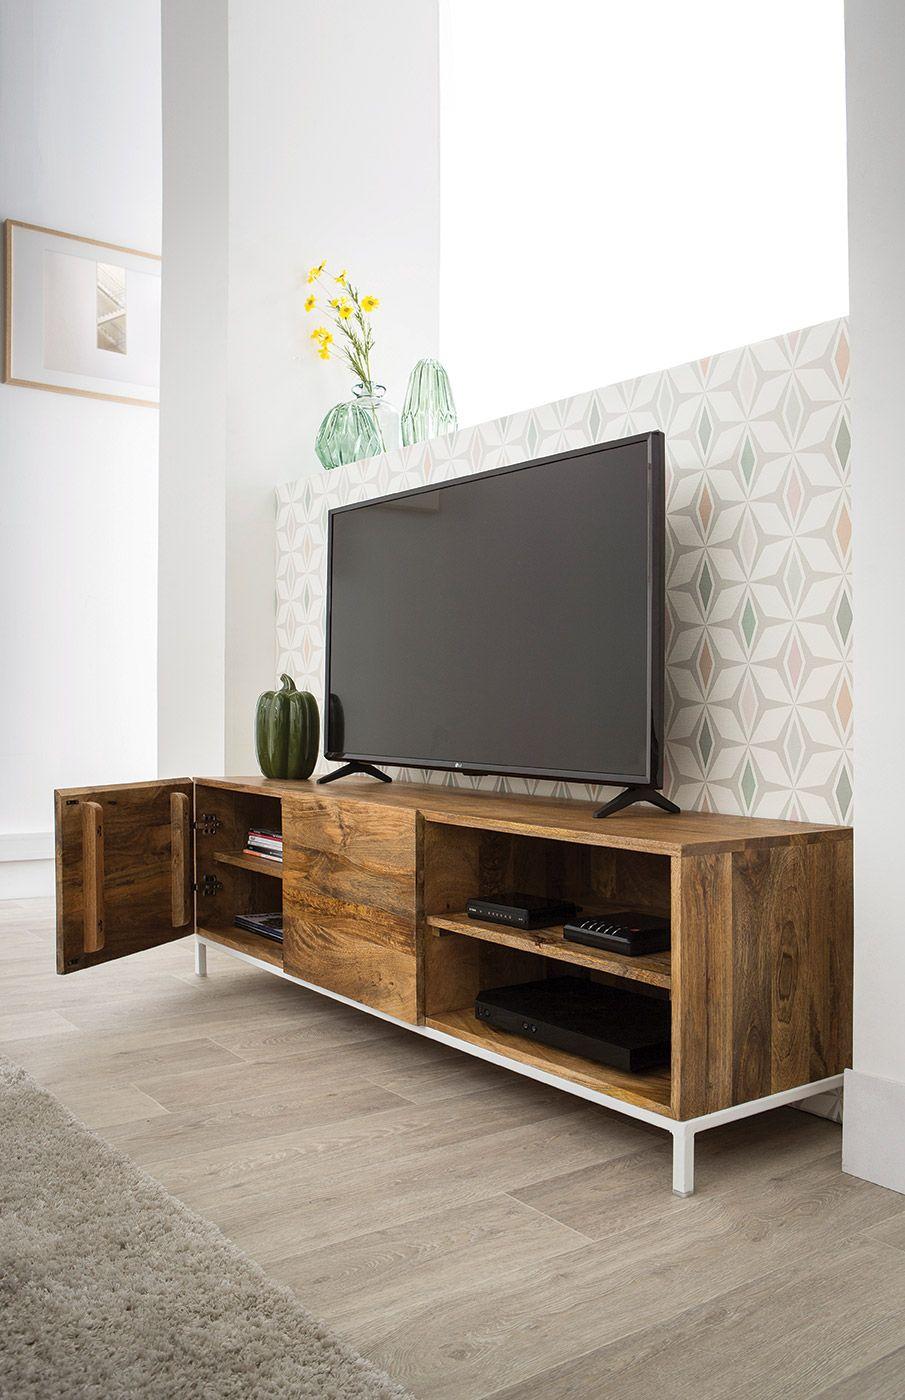 Meuble Tv Design Manguier Massif Et Metal Blanc 145cm Boho Miliboo Meuble Tv Design Idee De Decoration Decoration Maison